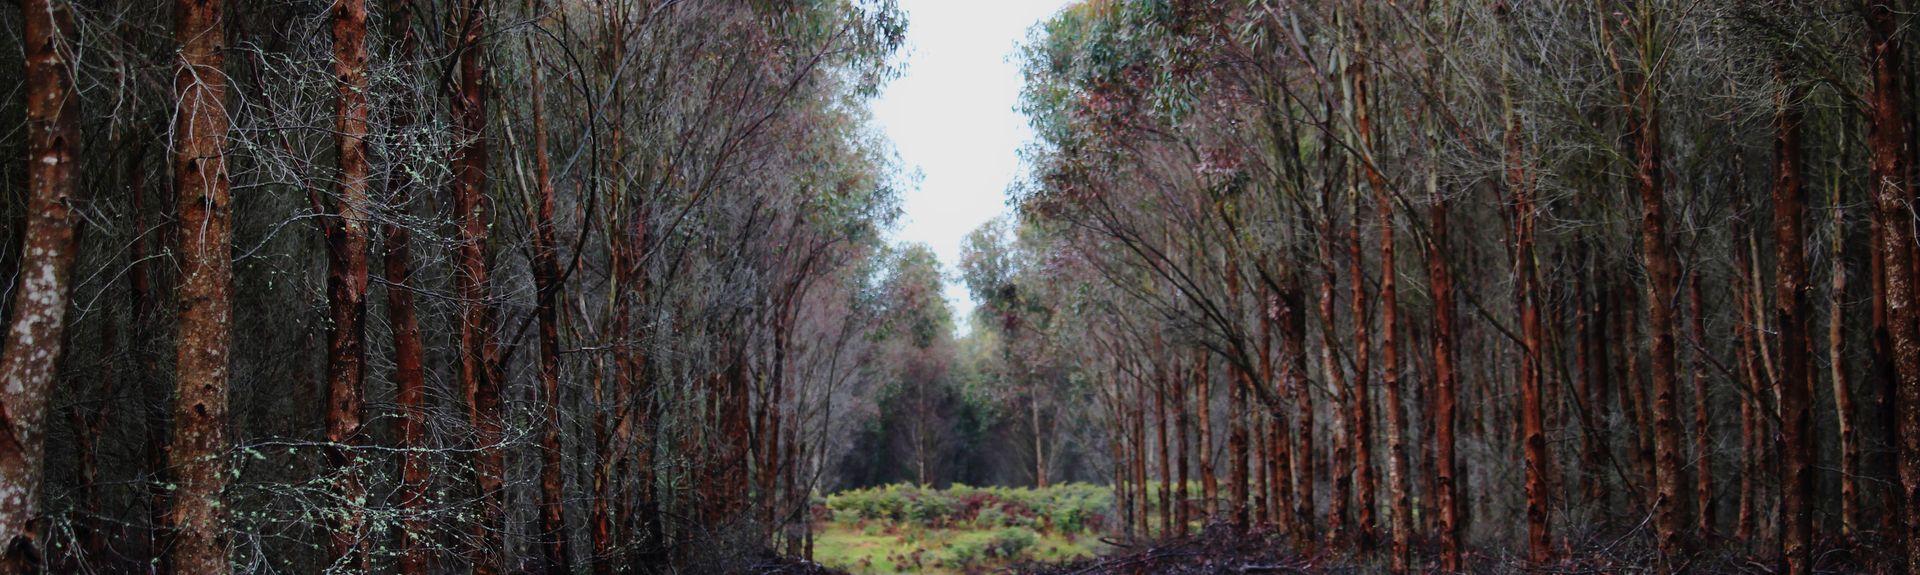 Enfield, VIC, Australia